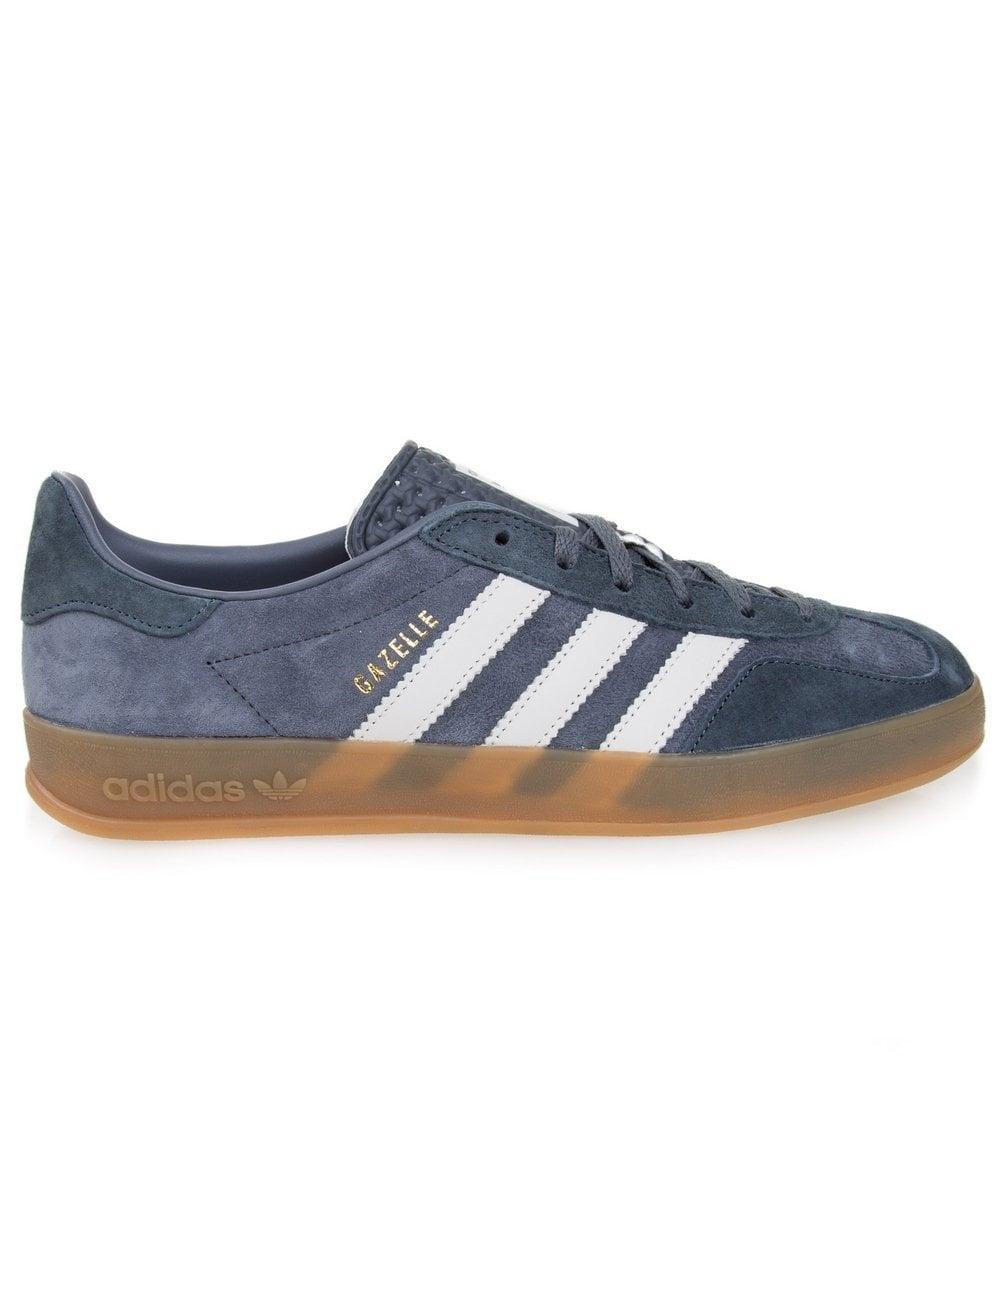 official photos 62a40 053c4 Adidas Originals Gazelle Indoor - Onix